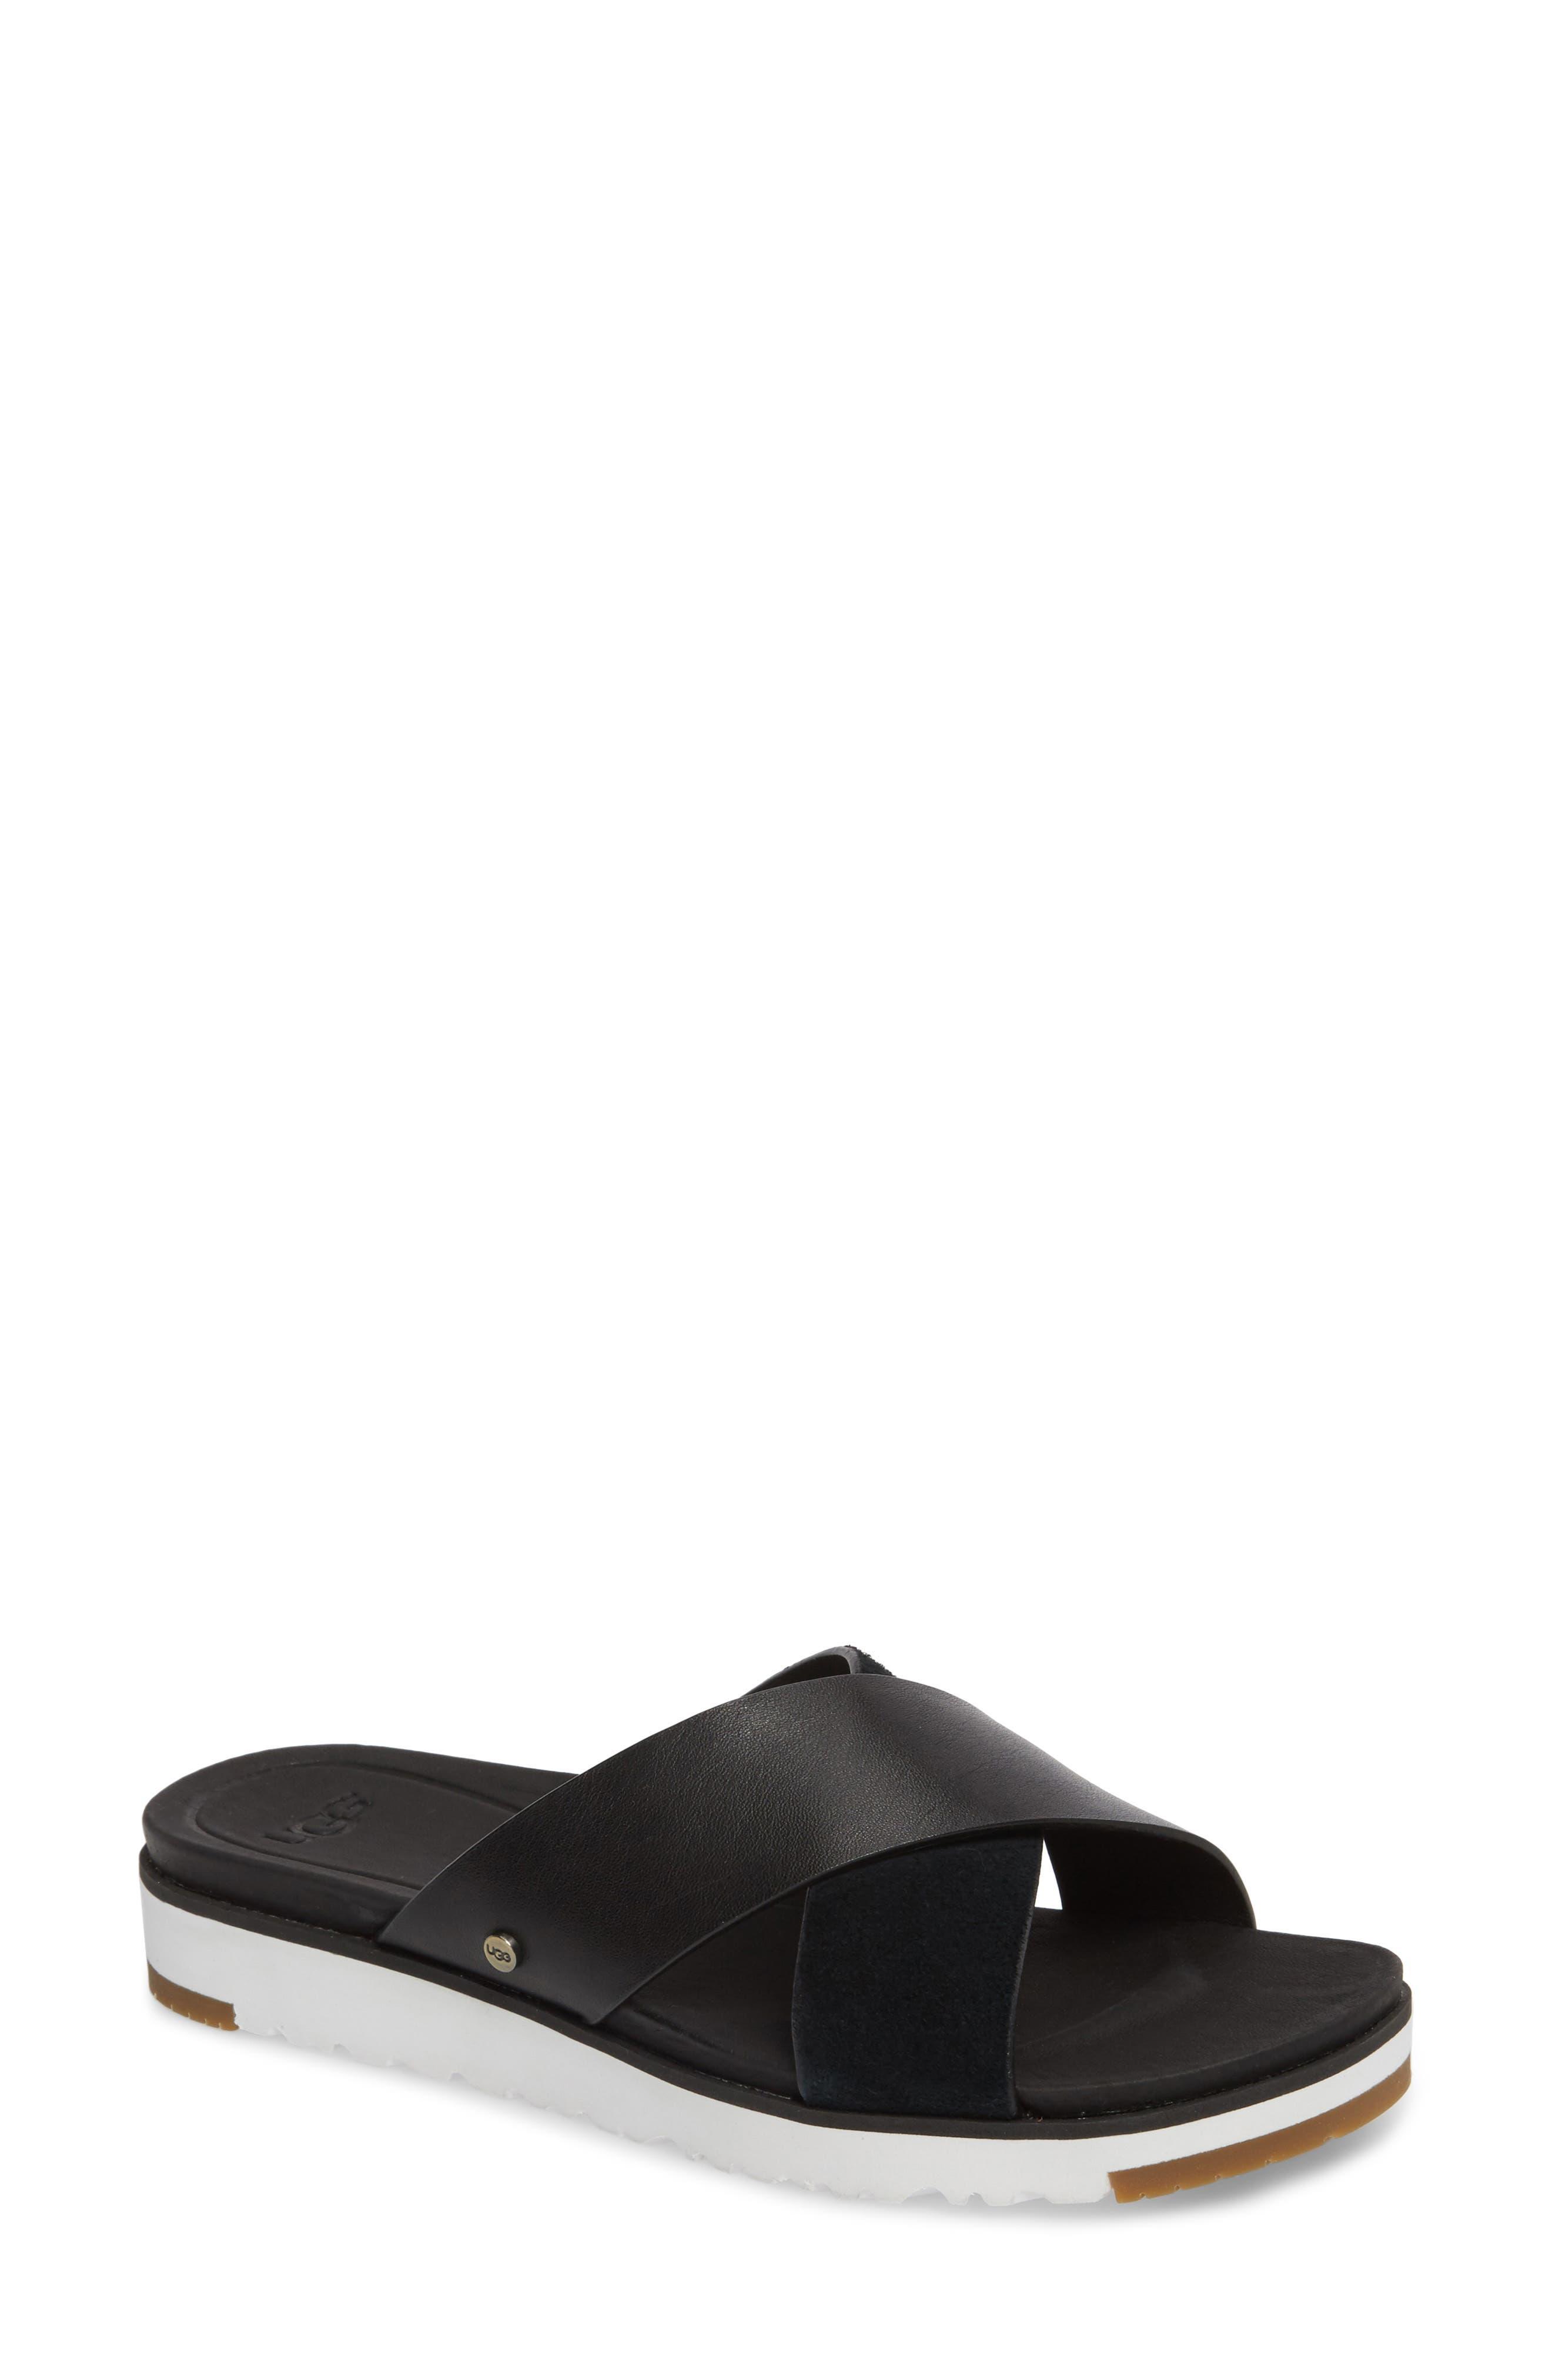 UGG<SUP>®</SUP>, 'Kari' Sandal, Main thumbnail 1, color, BLACK